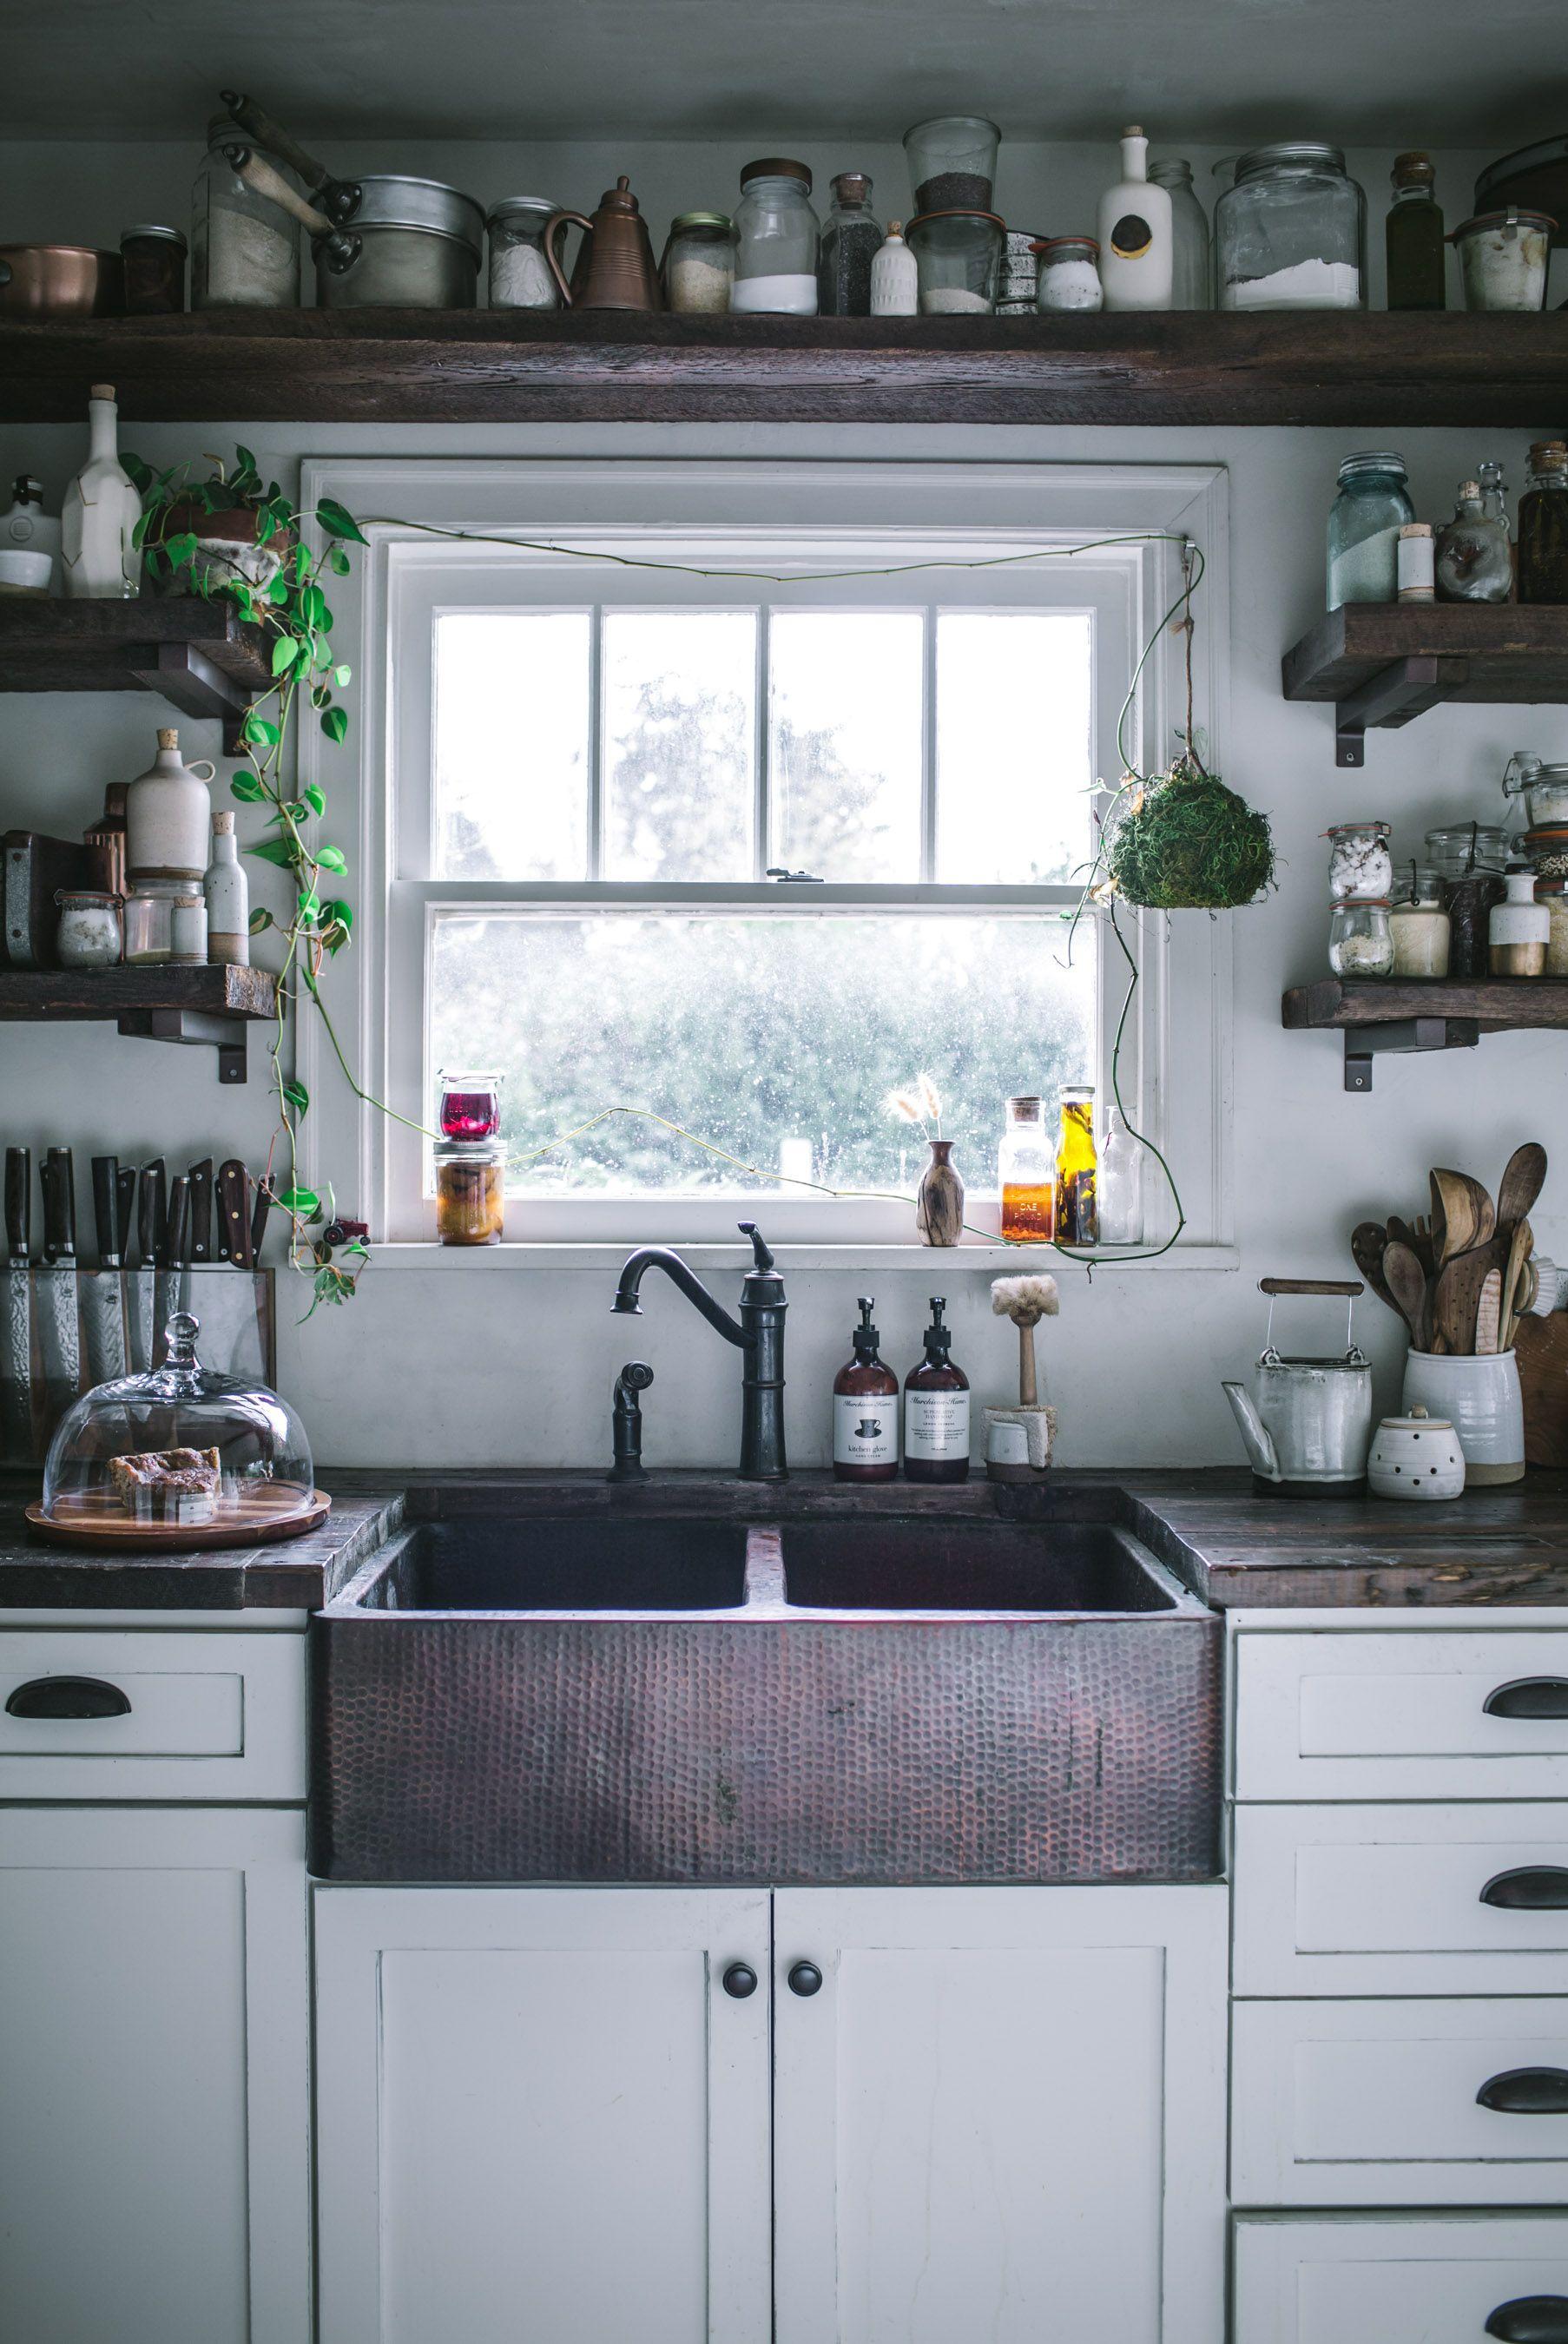 8 Tips For A Zero Waste Kitchen Adventures In Cooking Zero Waste Kitchen Eco Kitchen Kitchen Guide